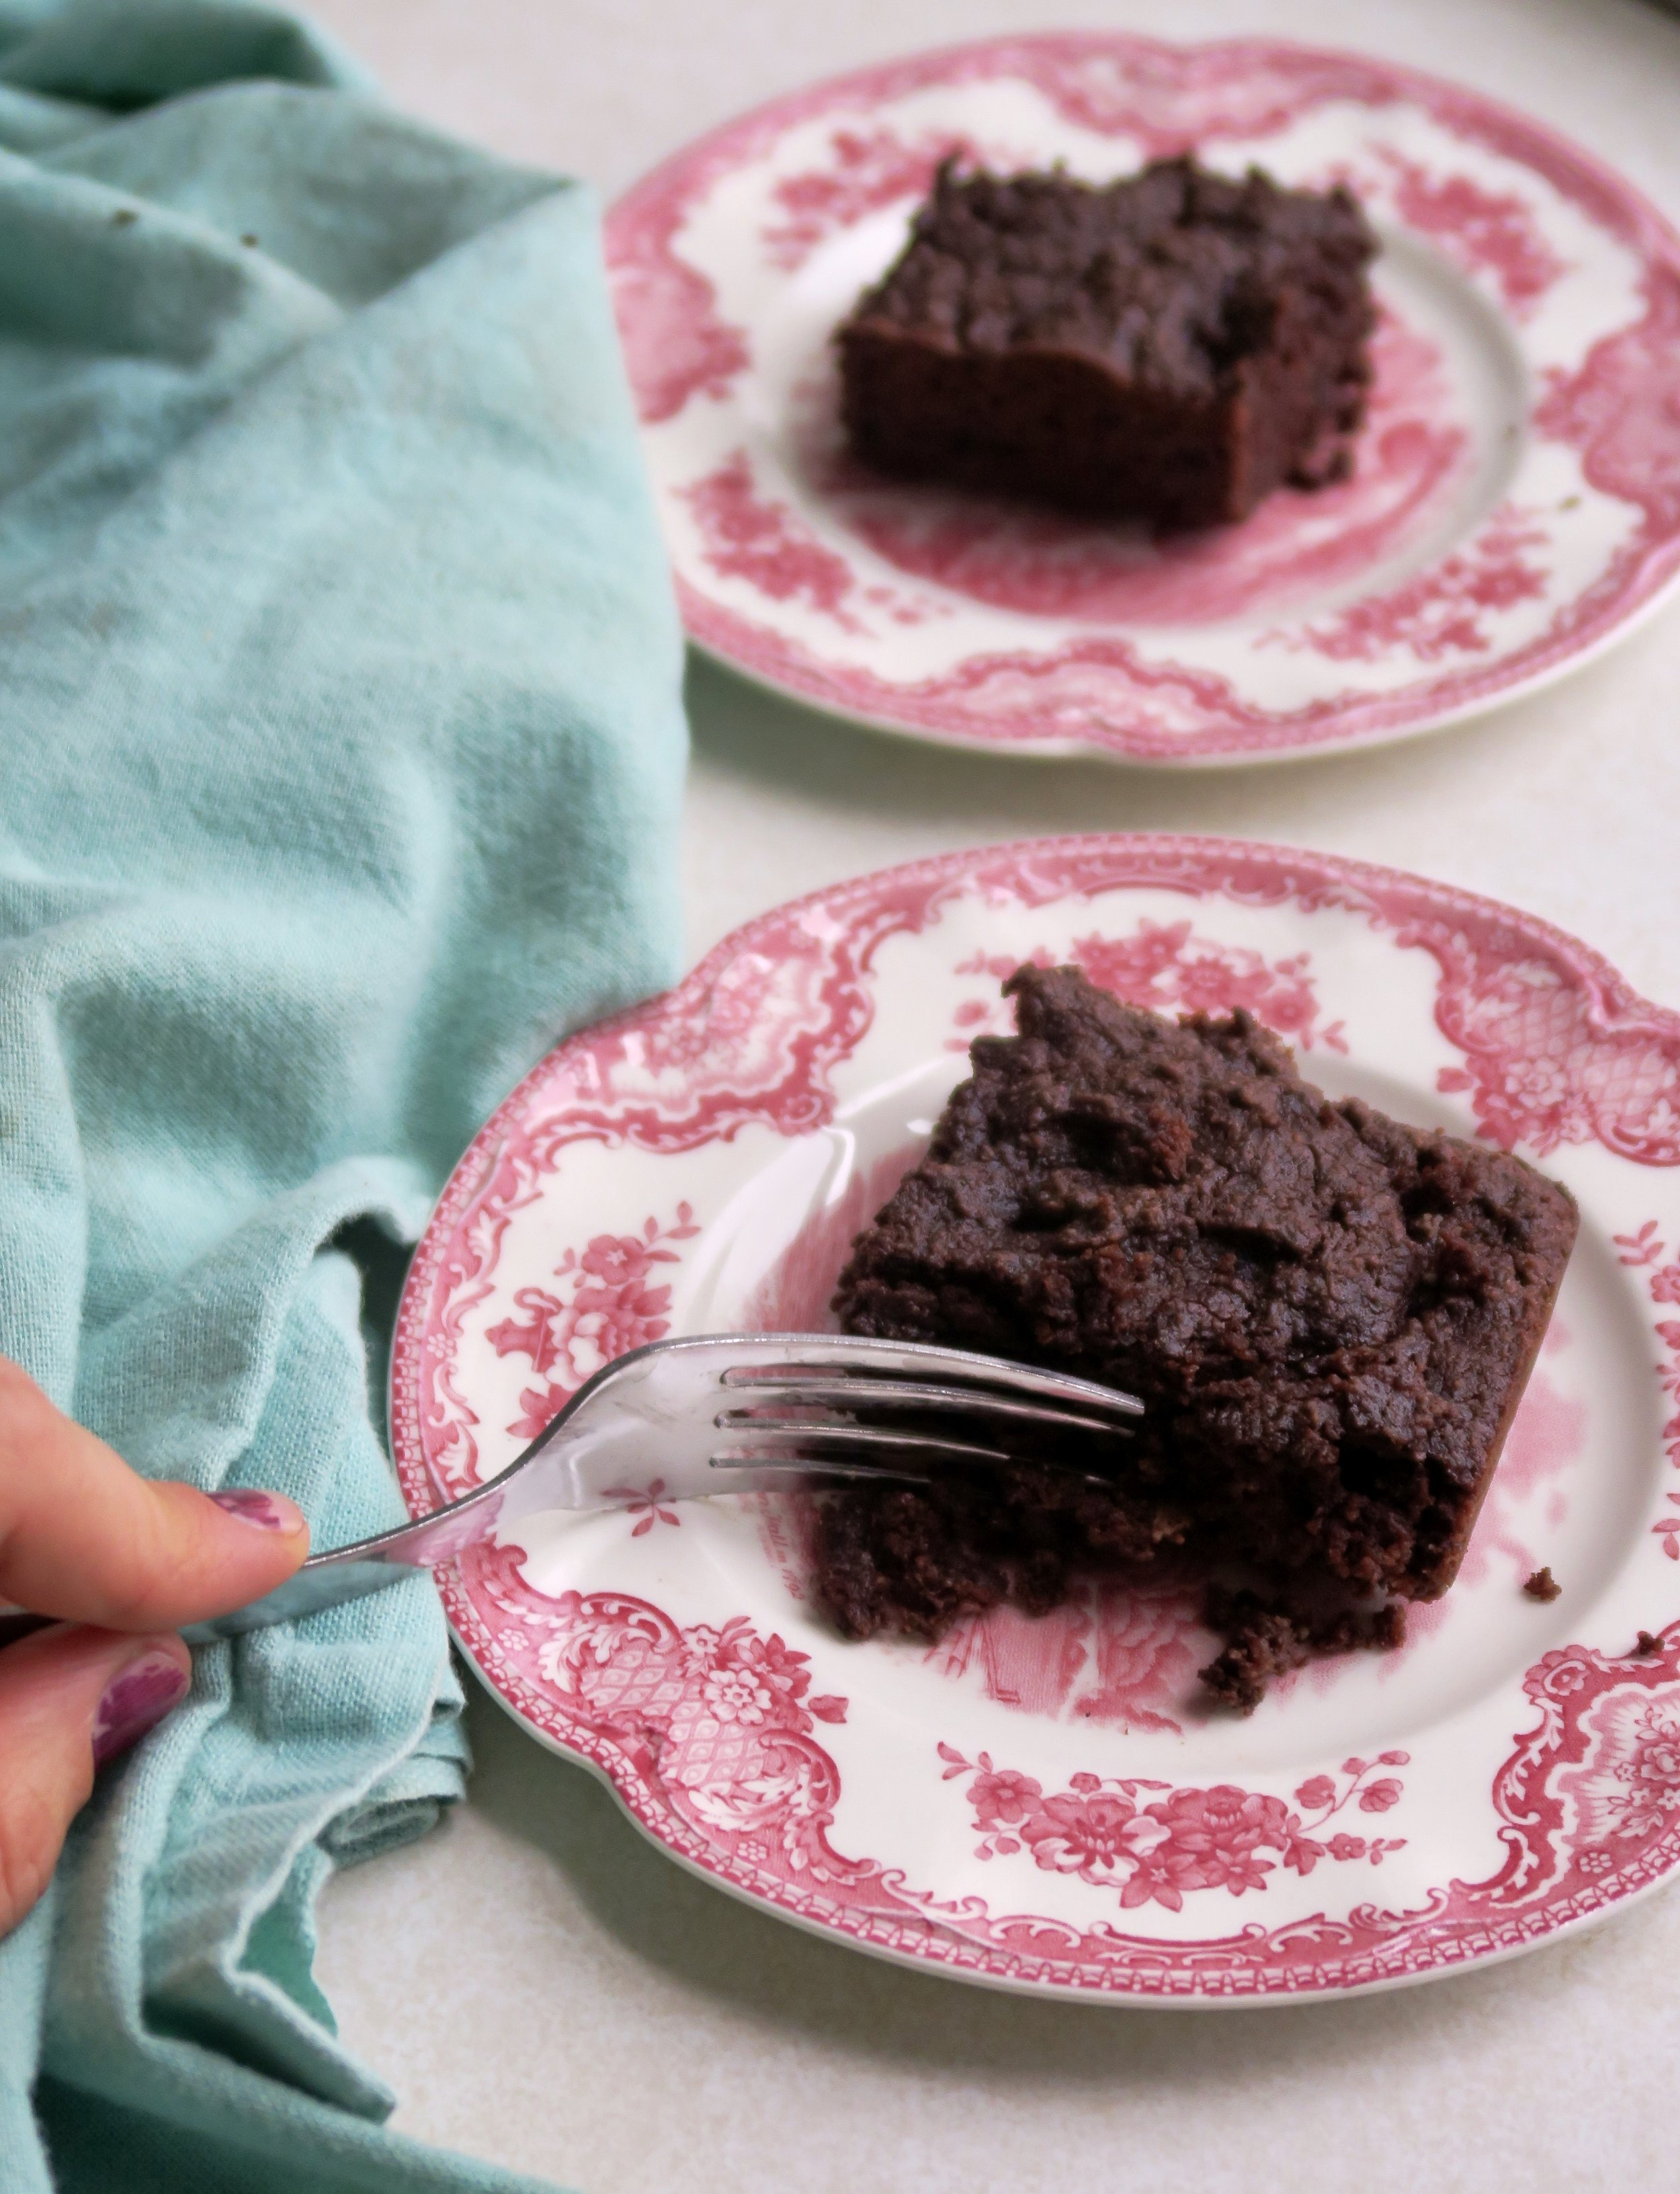 Chocolate Pear Snack Cake, Lake Superior Kitchen, Paleo cake, grain free cake, paleo dessert, grain free dessert, no sugar cake